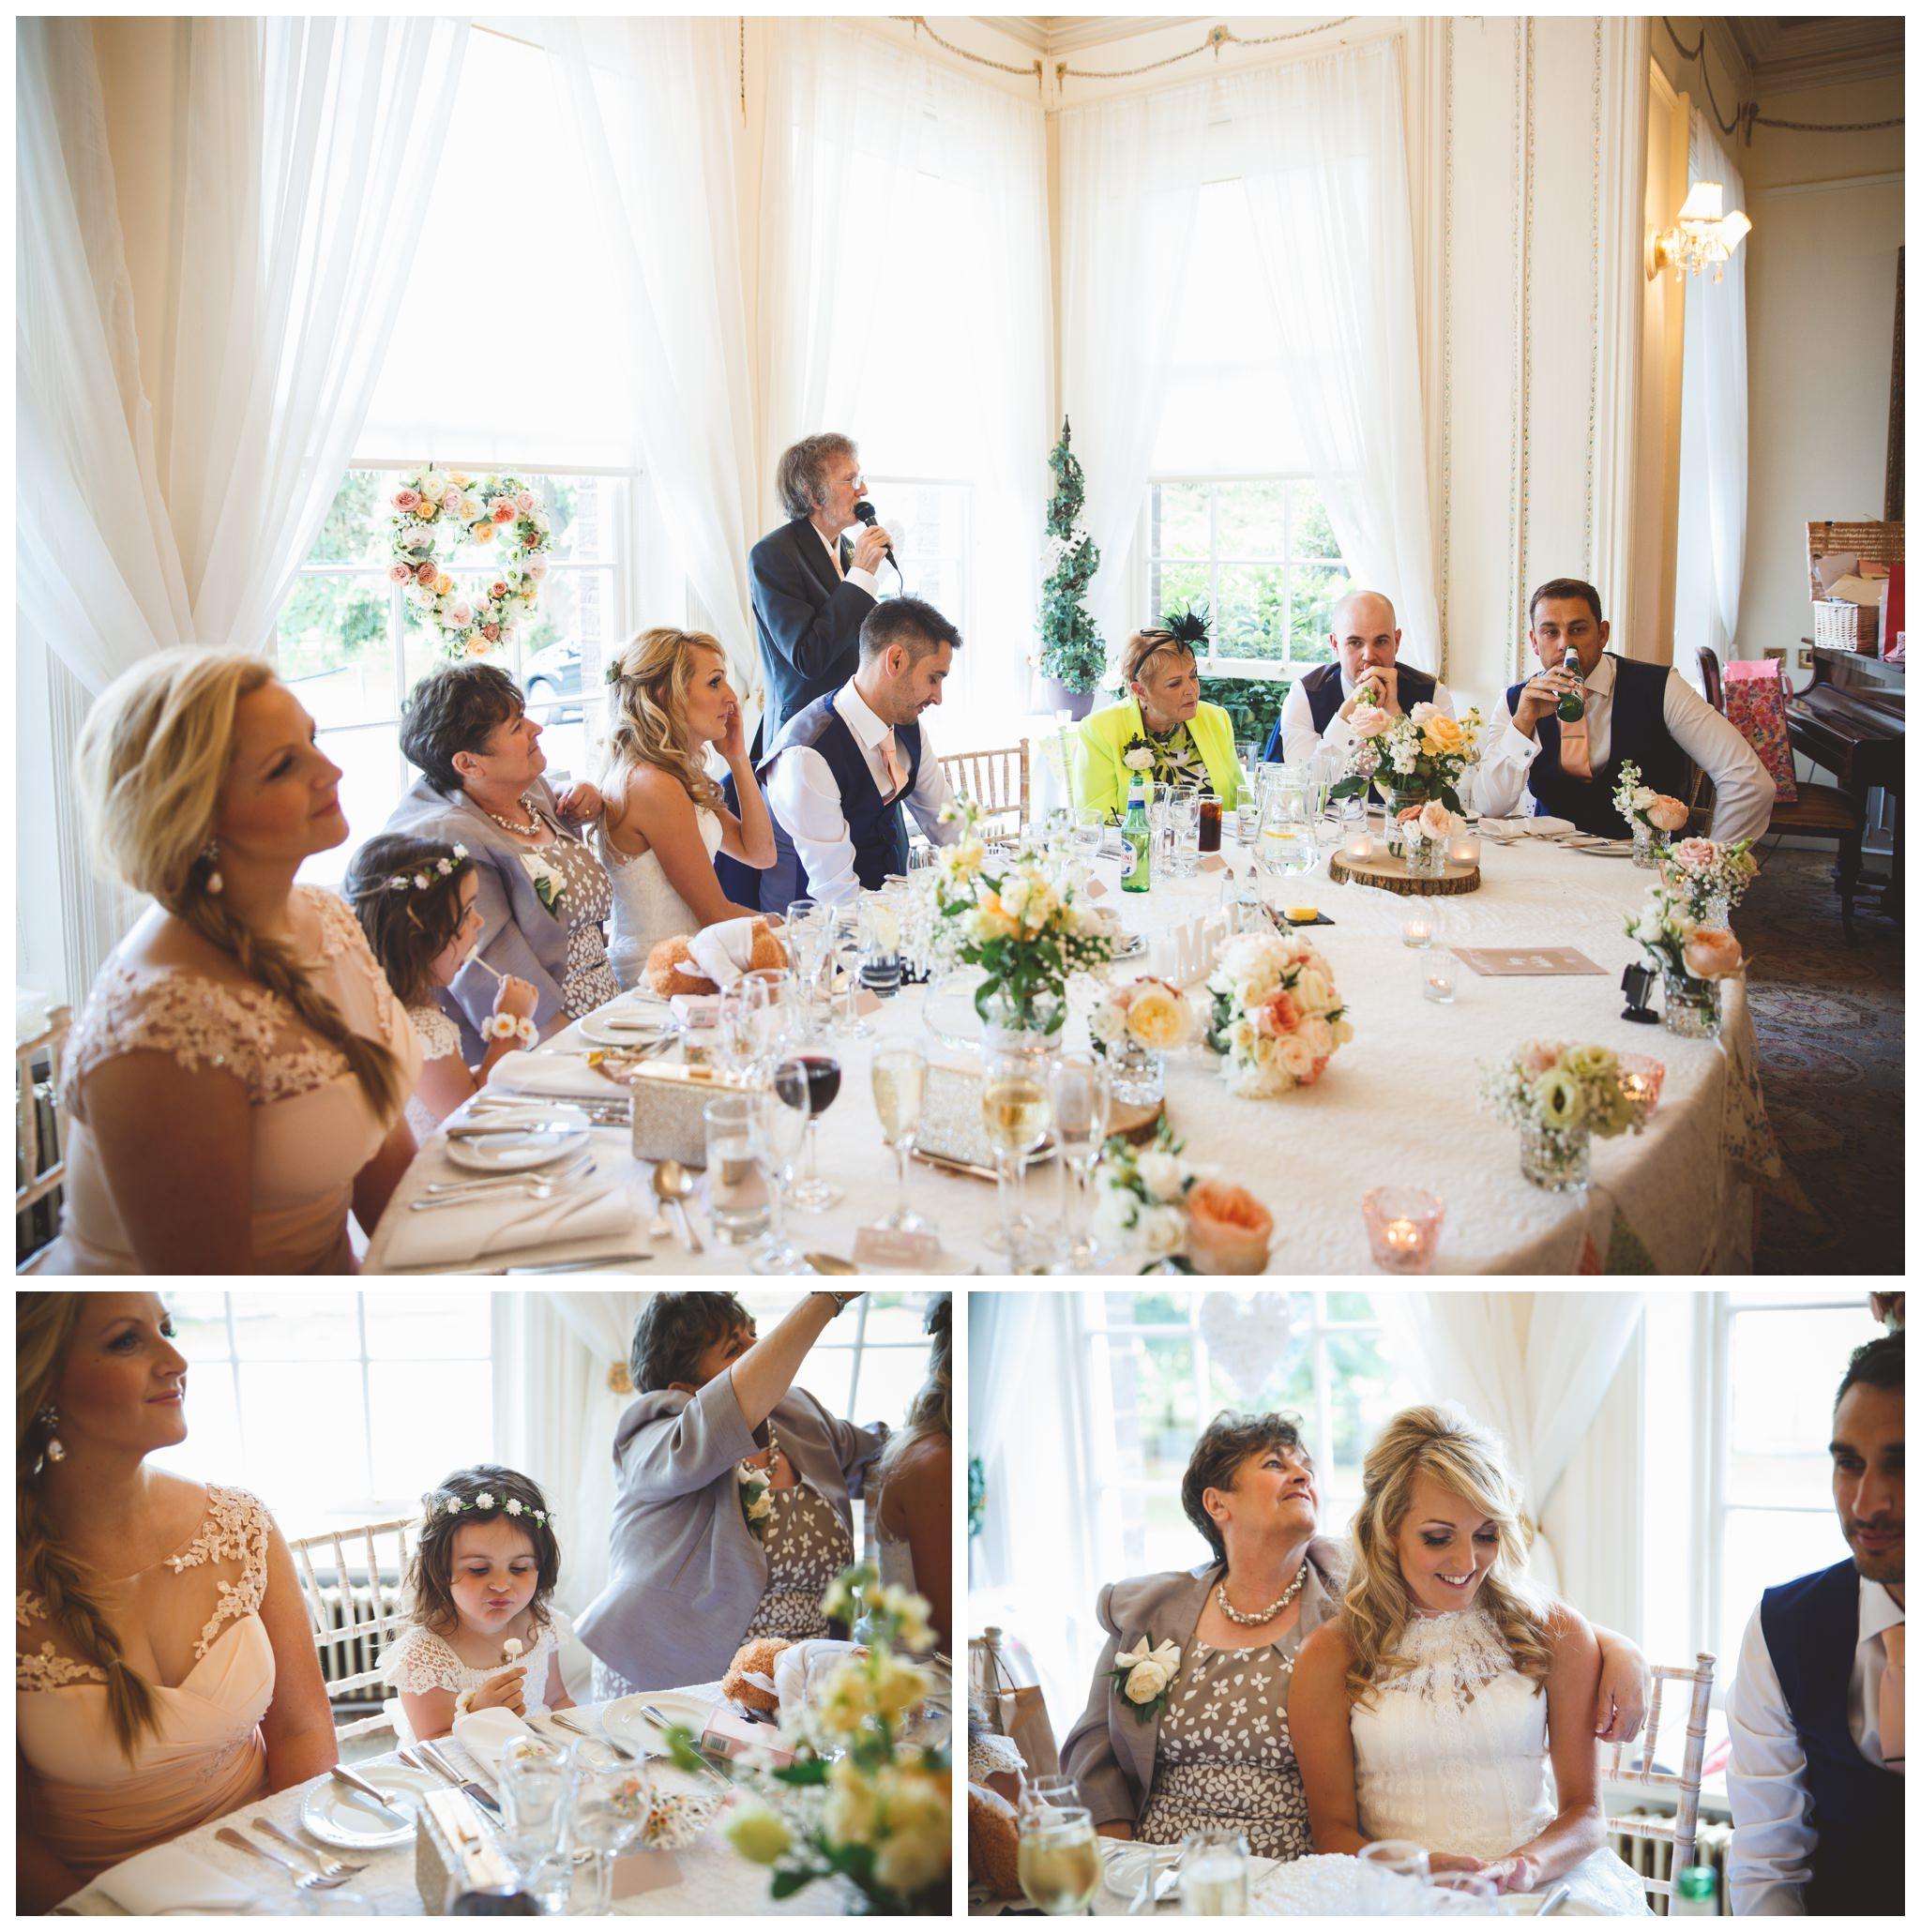 Richard Savage Photography - Wedding - Peterstone Court Brecon - 2016-05-11_0046